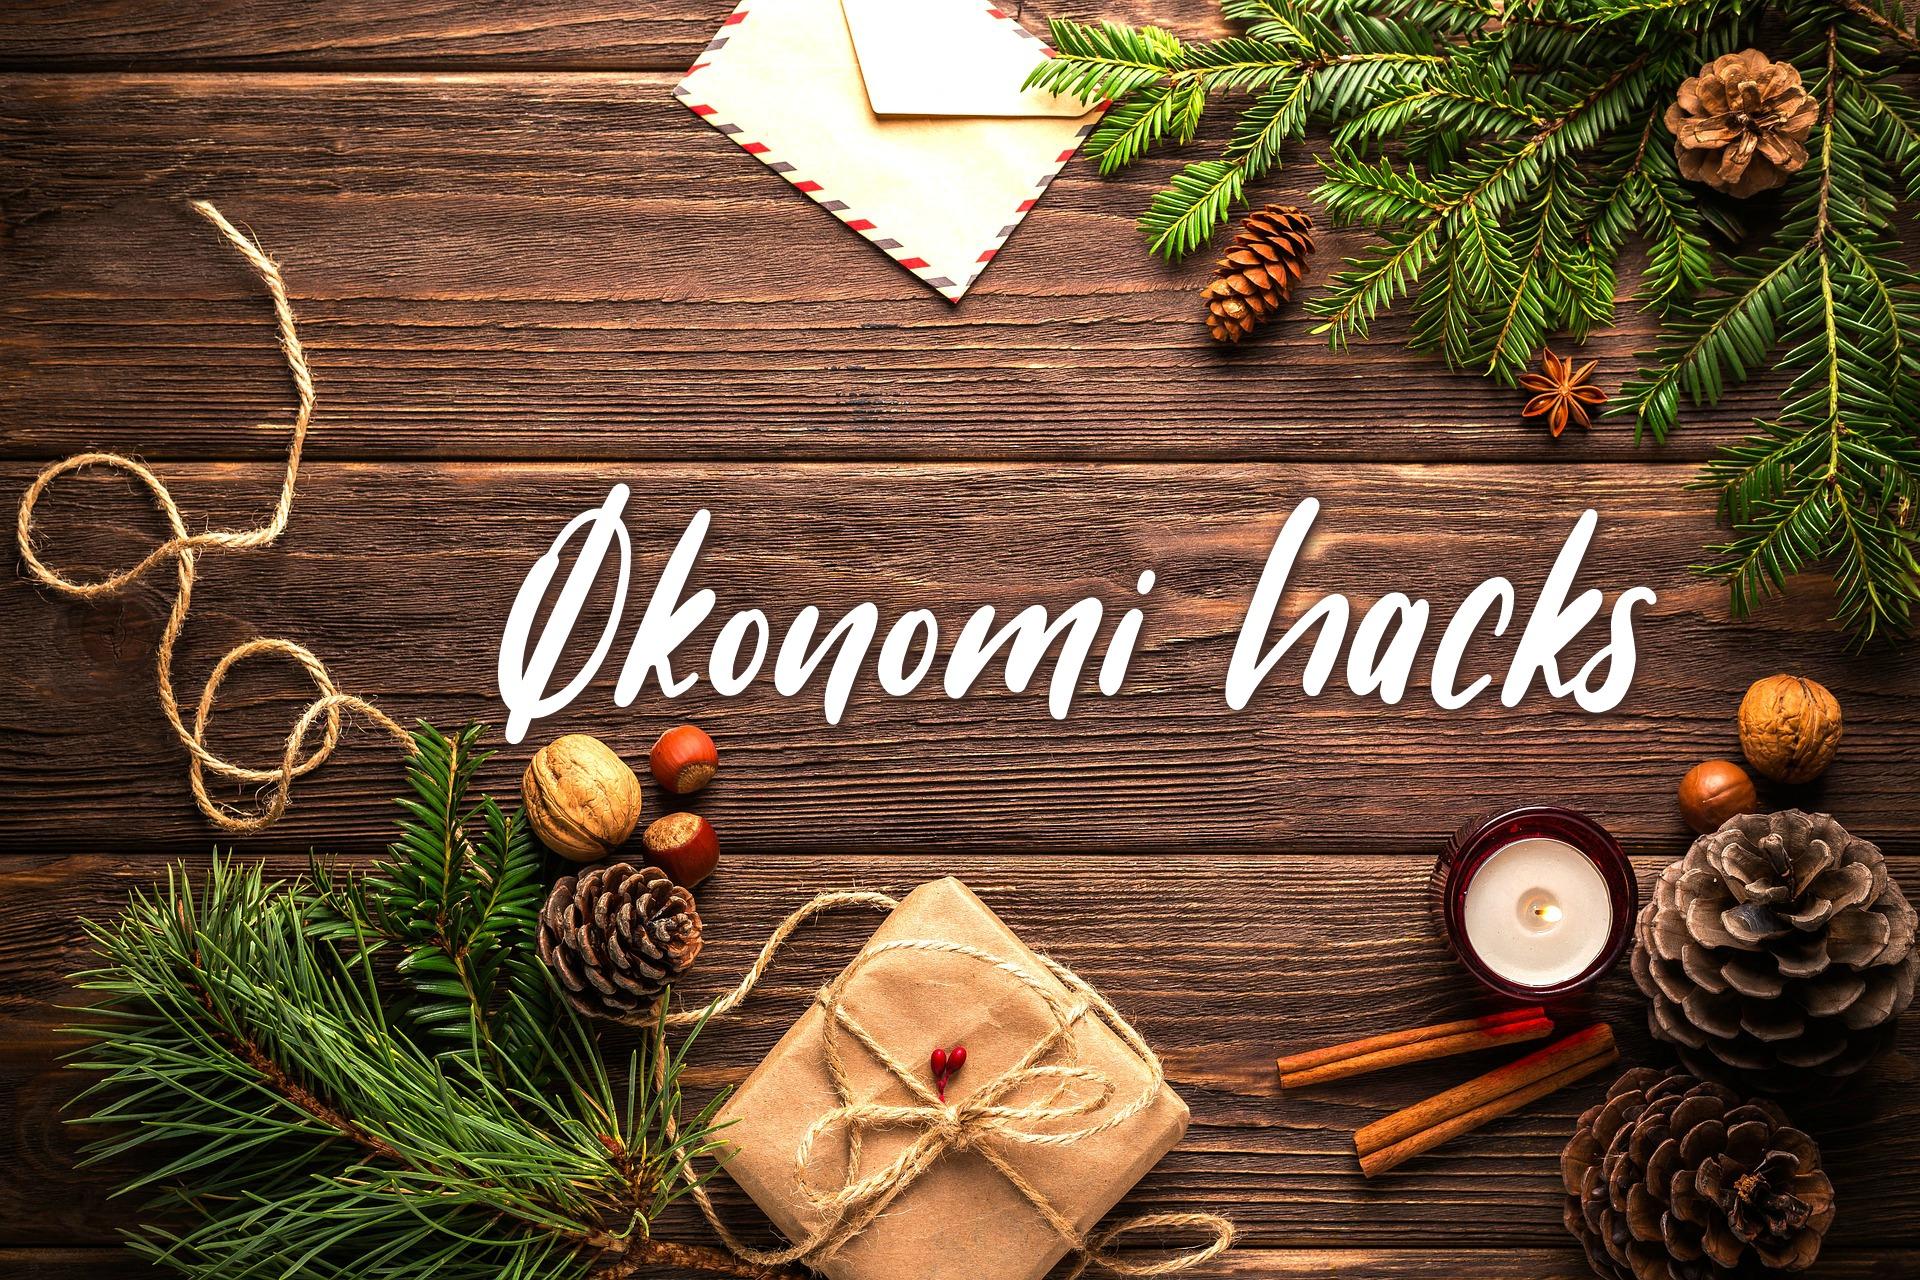 oekonomihacks-flere-penge-i-december